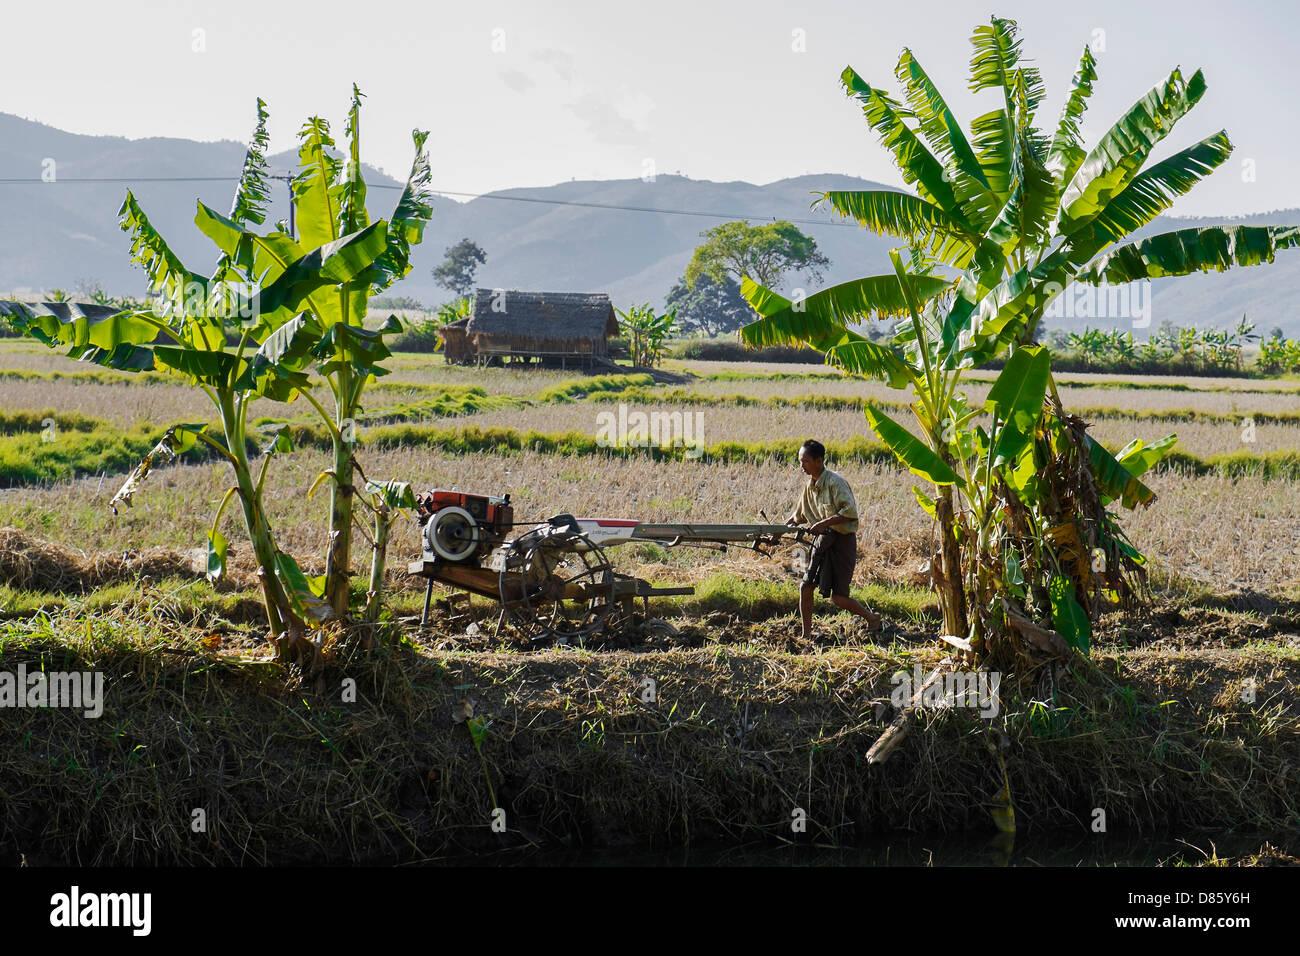 Farmer working on field, Nyaung Shwe, Myanmar, Asia - Stock Image